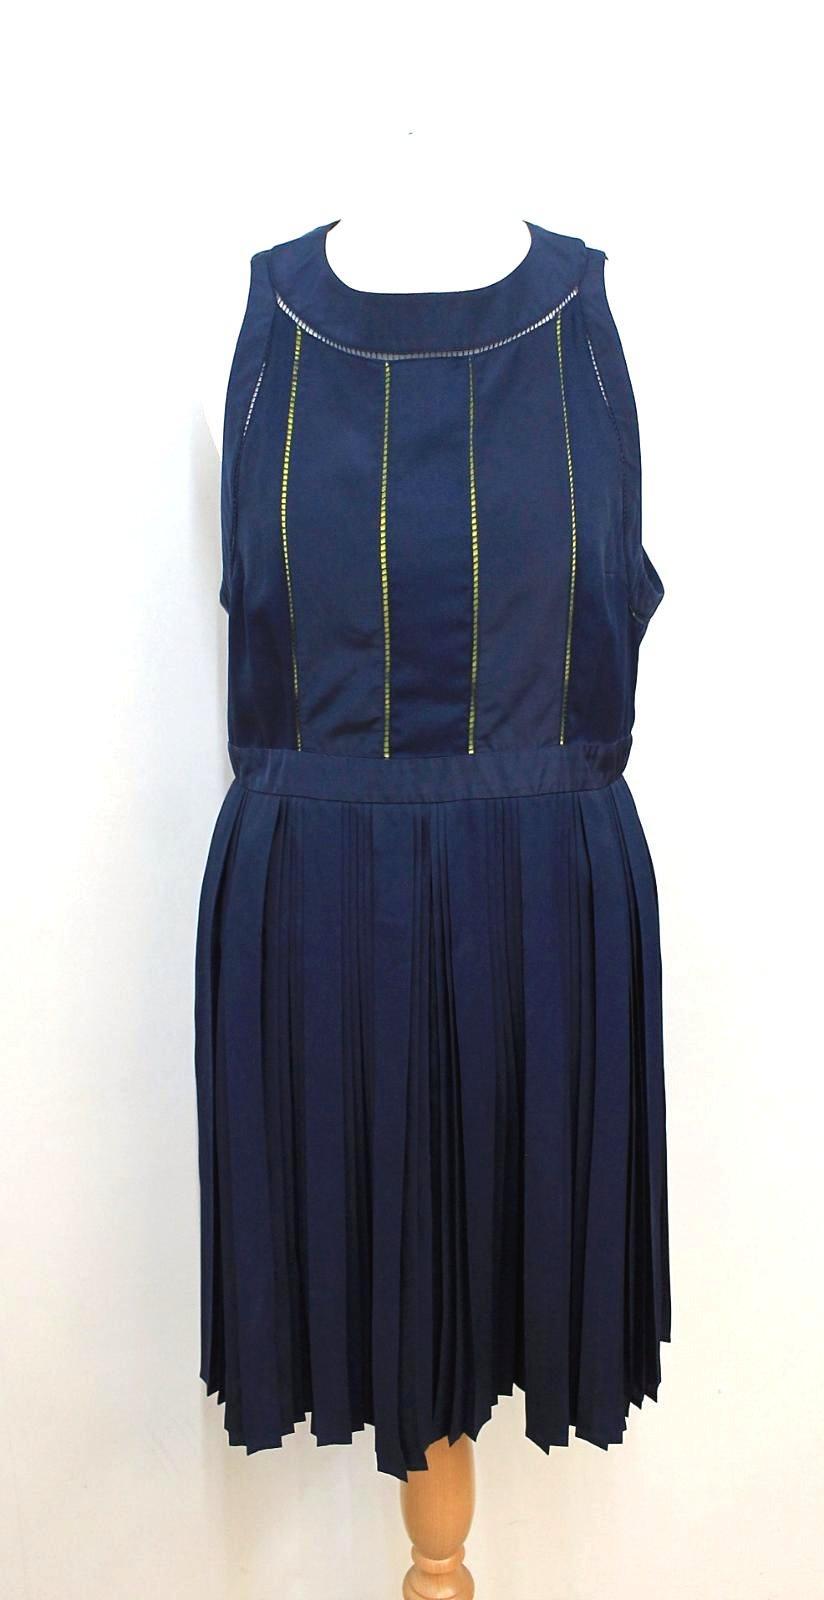 KENZO-PARIS-Ladies-Navy-Blue-Neon-Yellow-Sleeveless-Shift-Dress-FR42-UK14 thumbnail 12